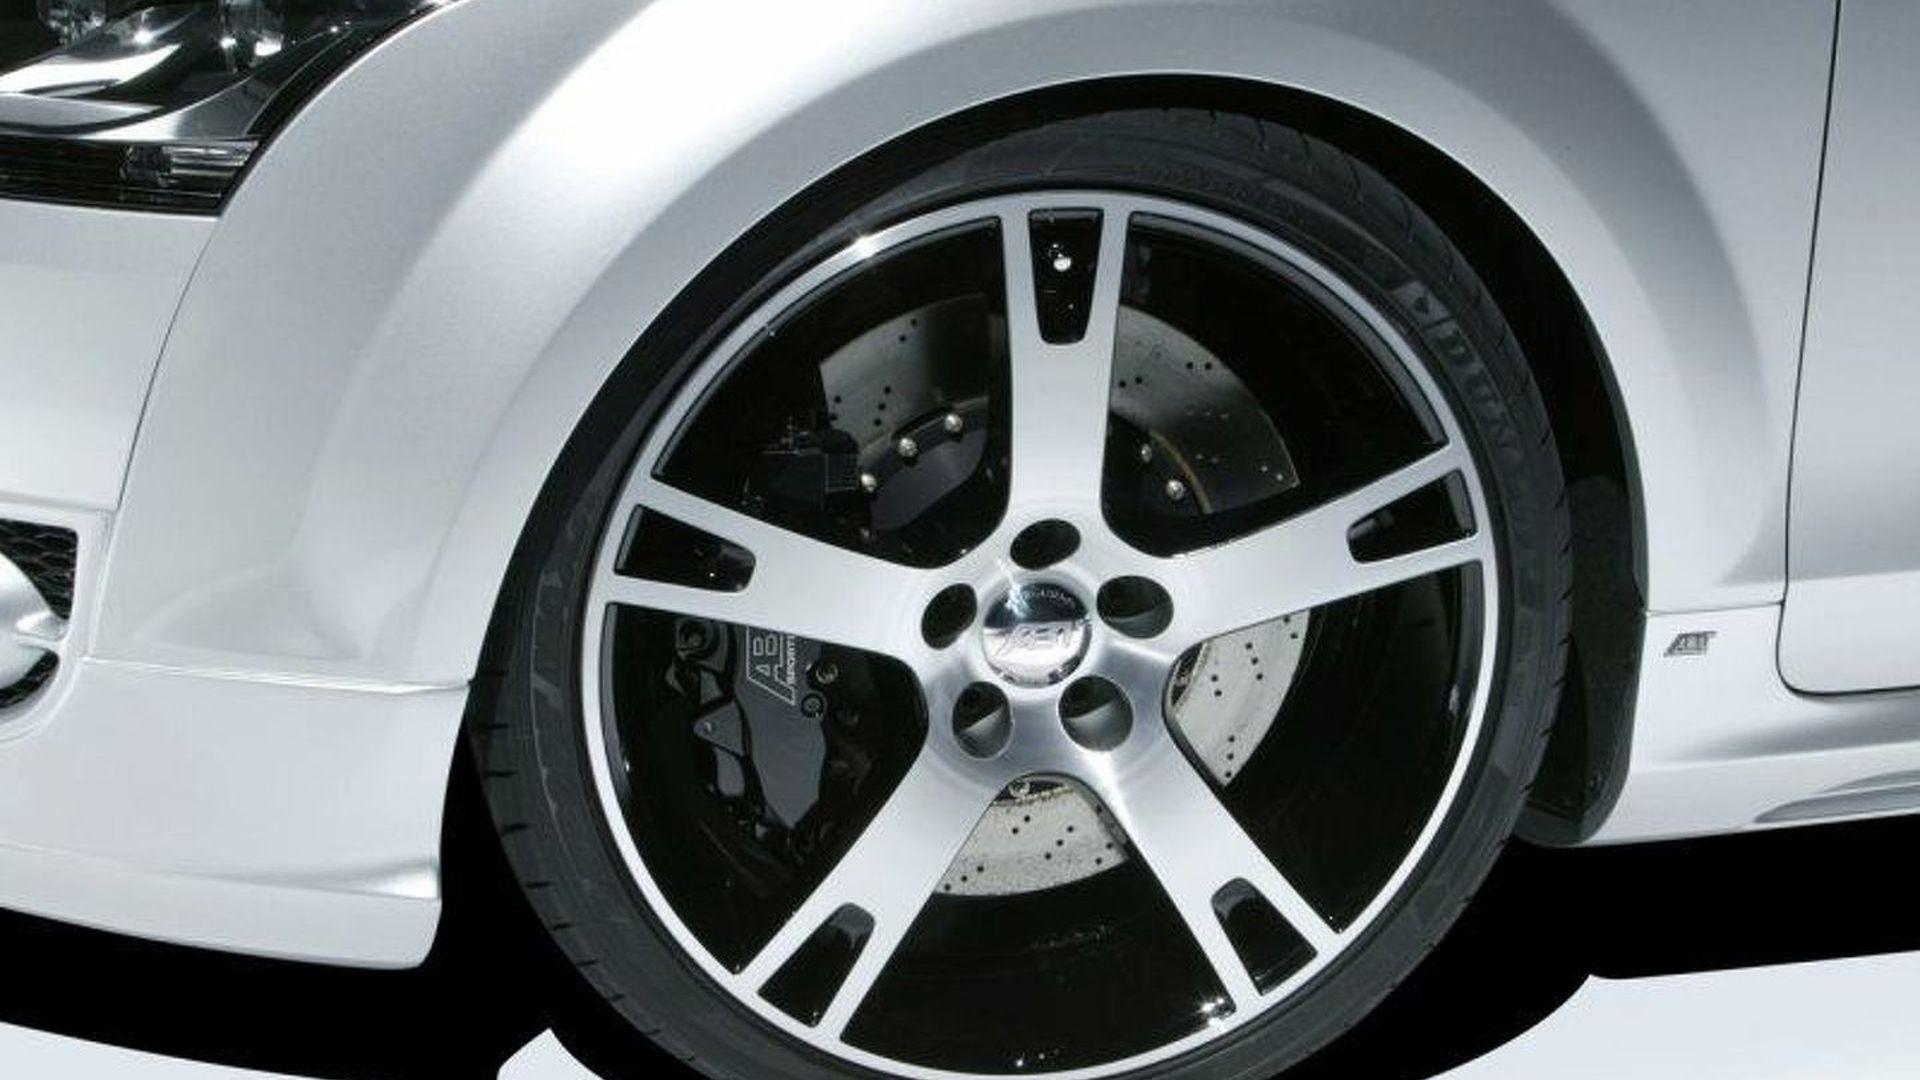 Abt releases 20inch big brake kit